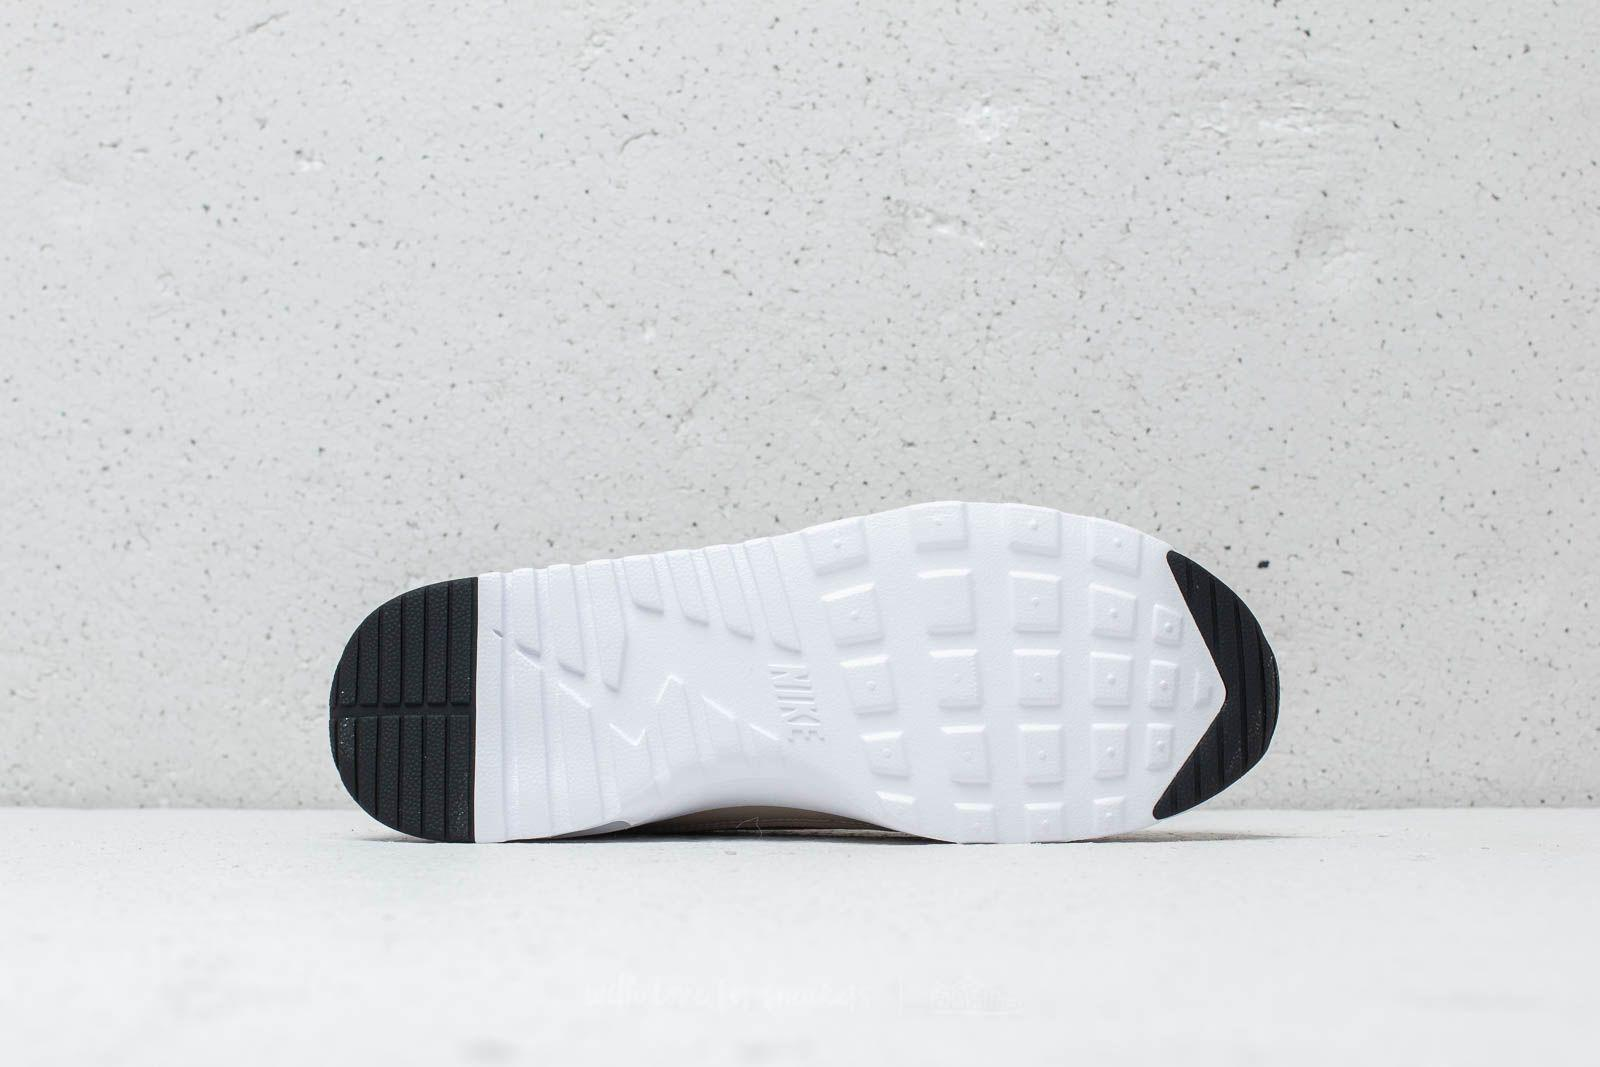 f9a6b4fae4c0 Lyst - Nike Wmns Air Max Thea String  Light Cream-black-white in White